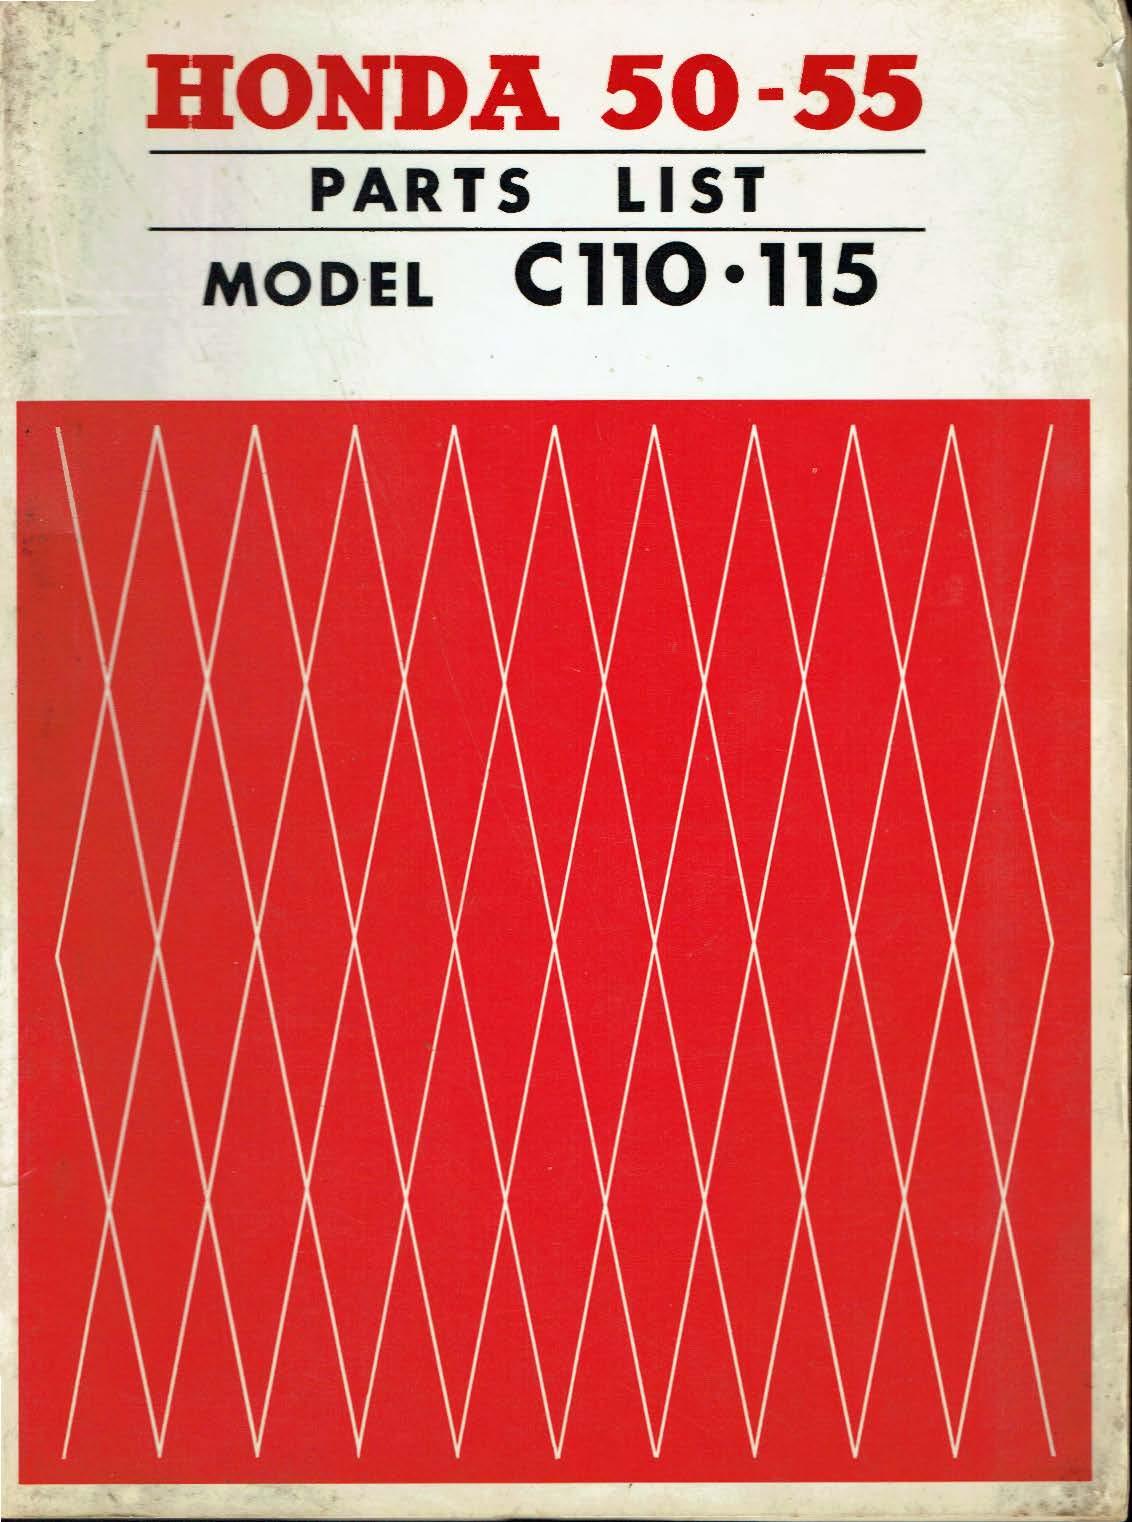 Parts list for Honda C115 (1963)